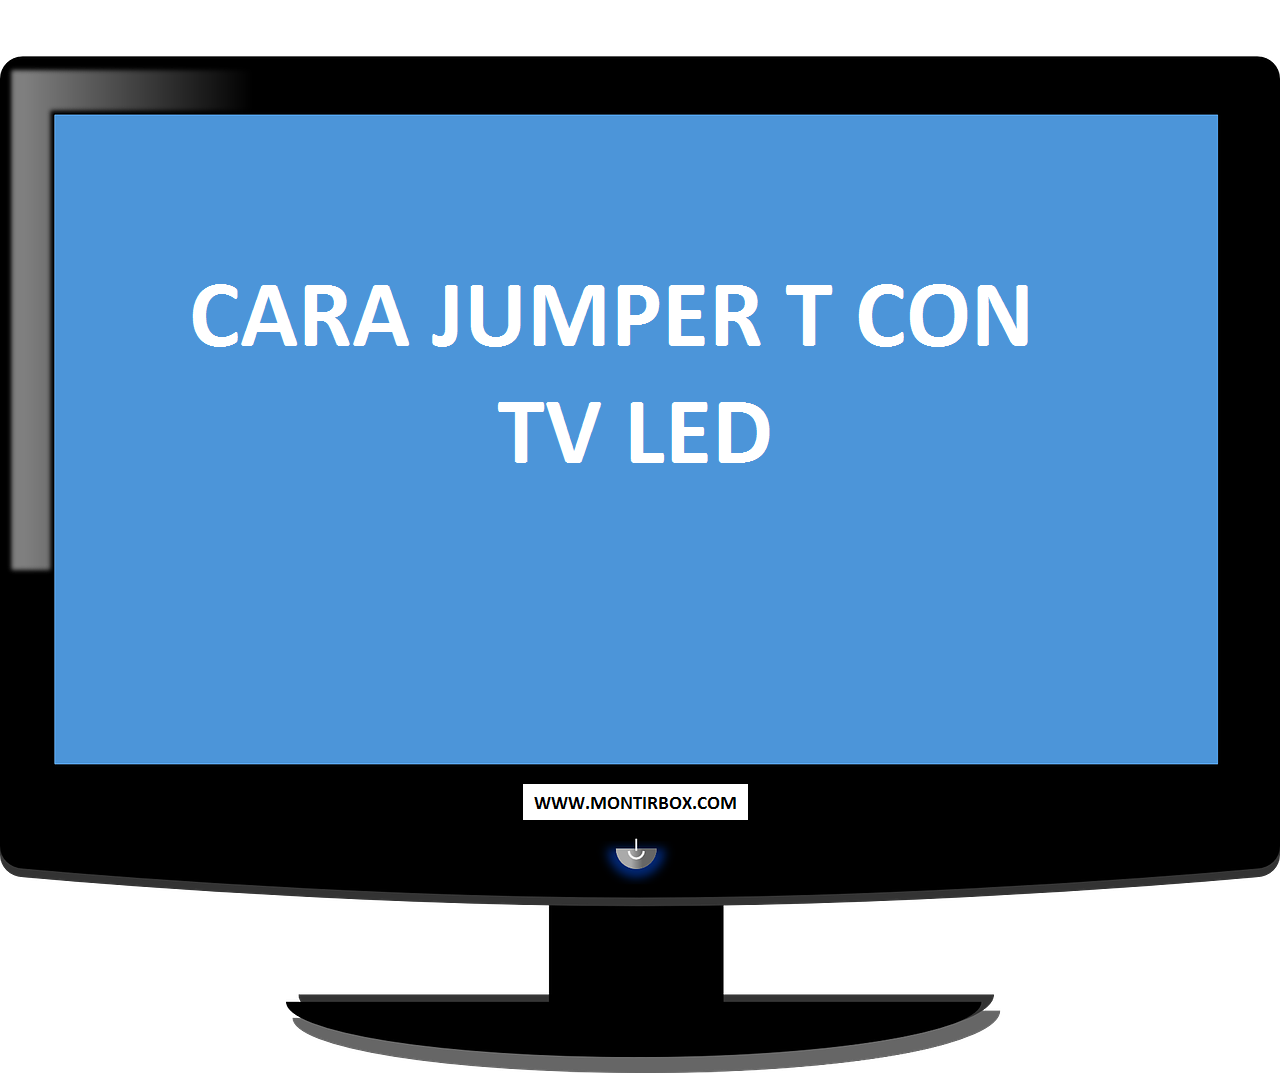 Cara Jumper T Con